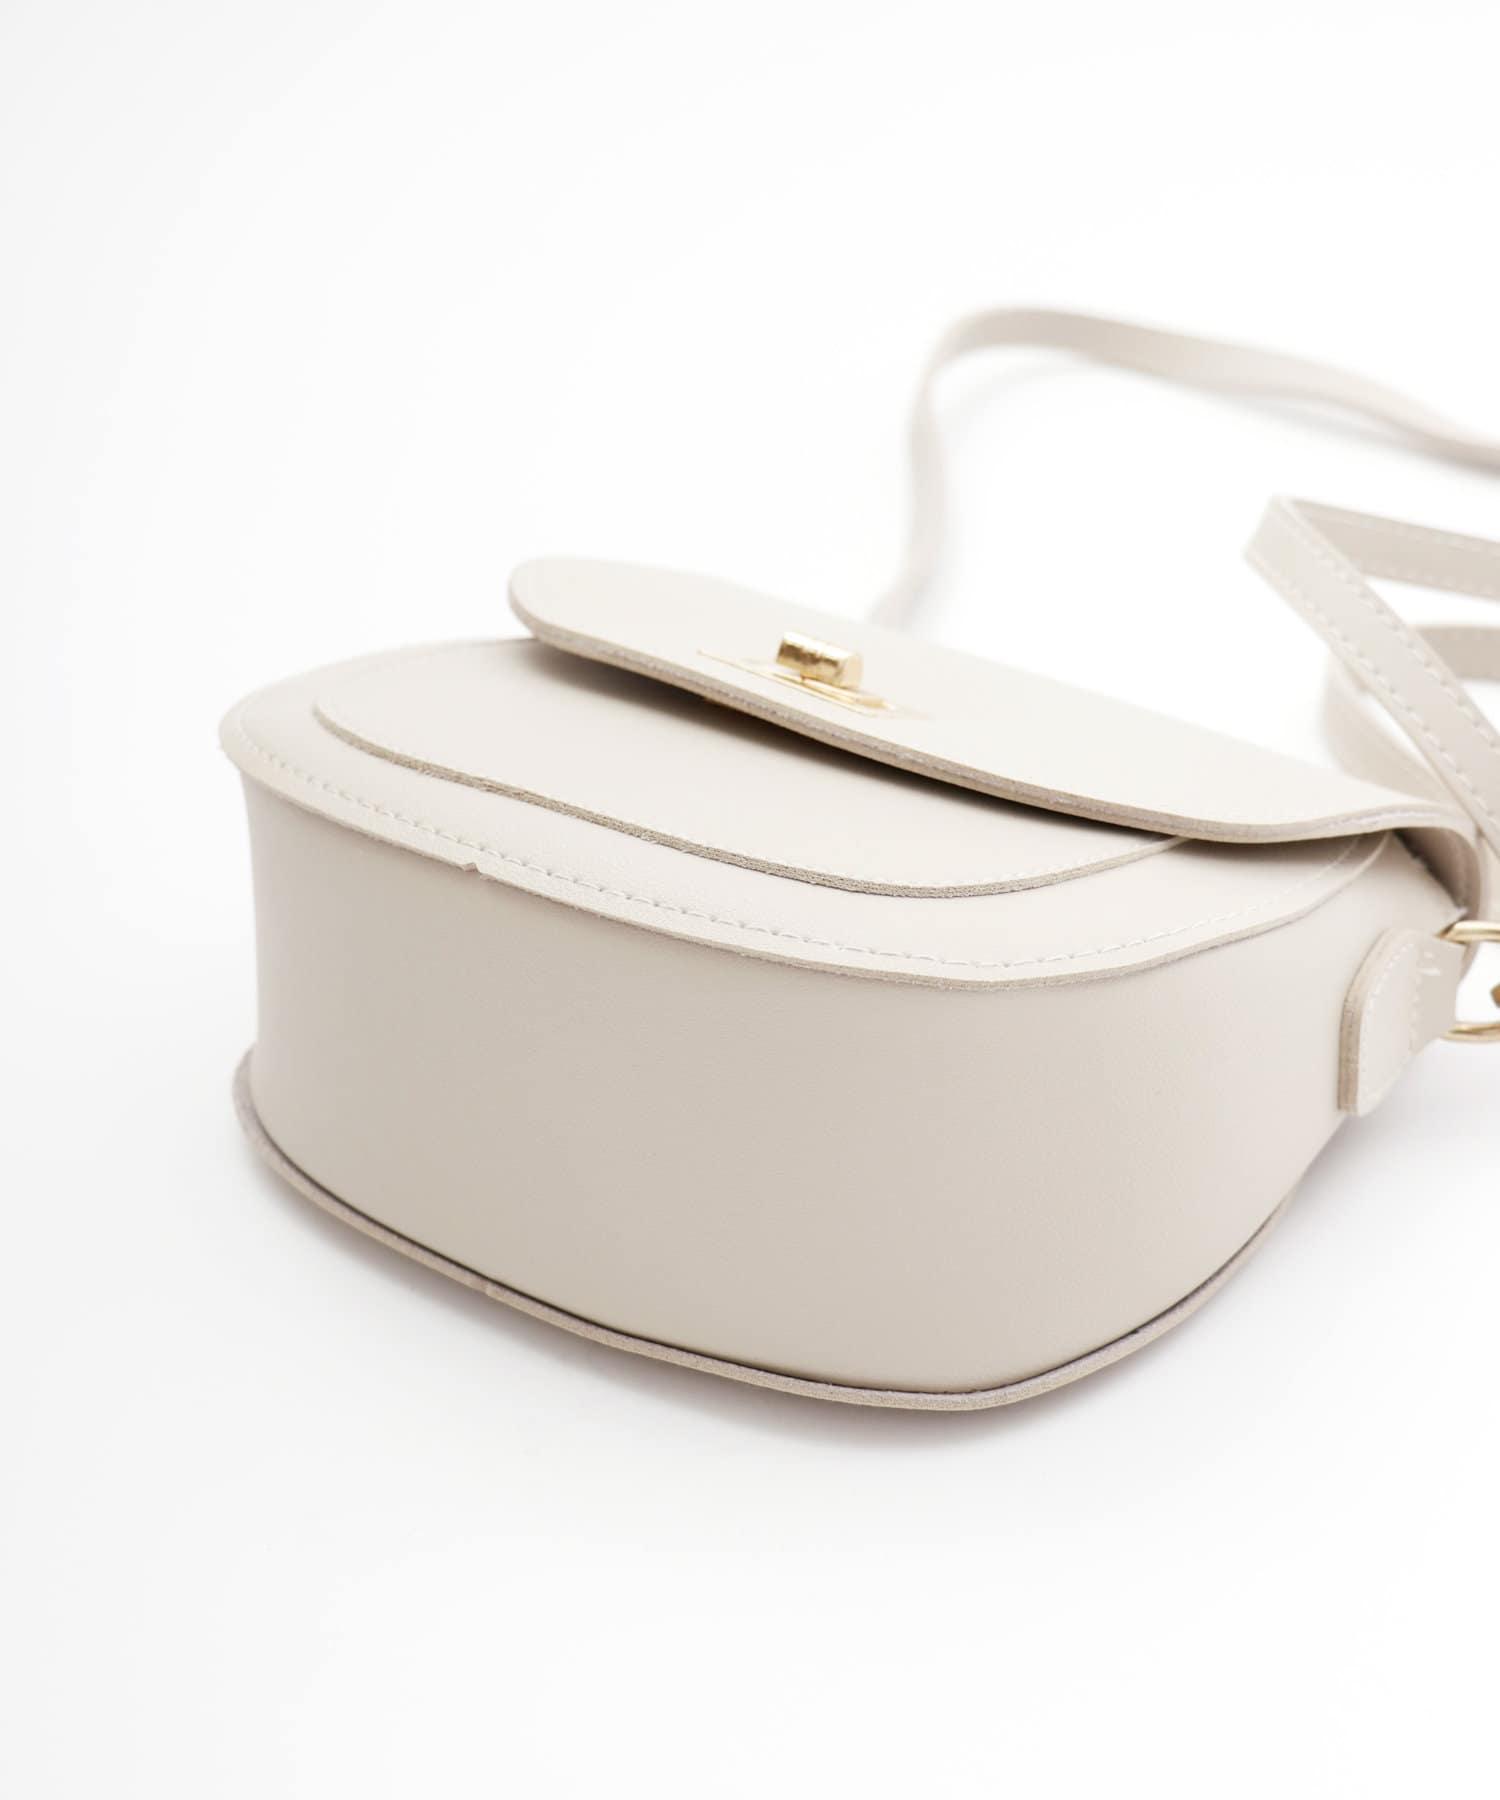 ASOKO(アソコ) 【動画付き】【WEB限定】丸型ショルダーバッグ